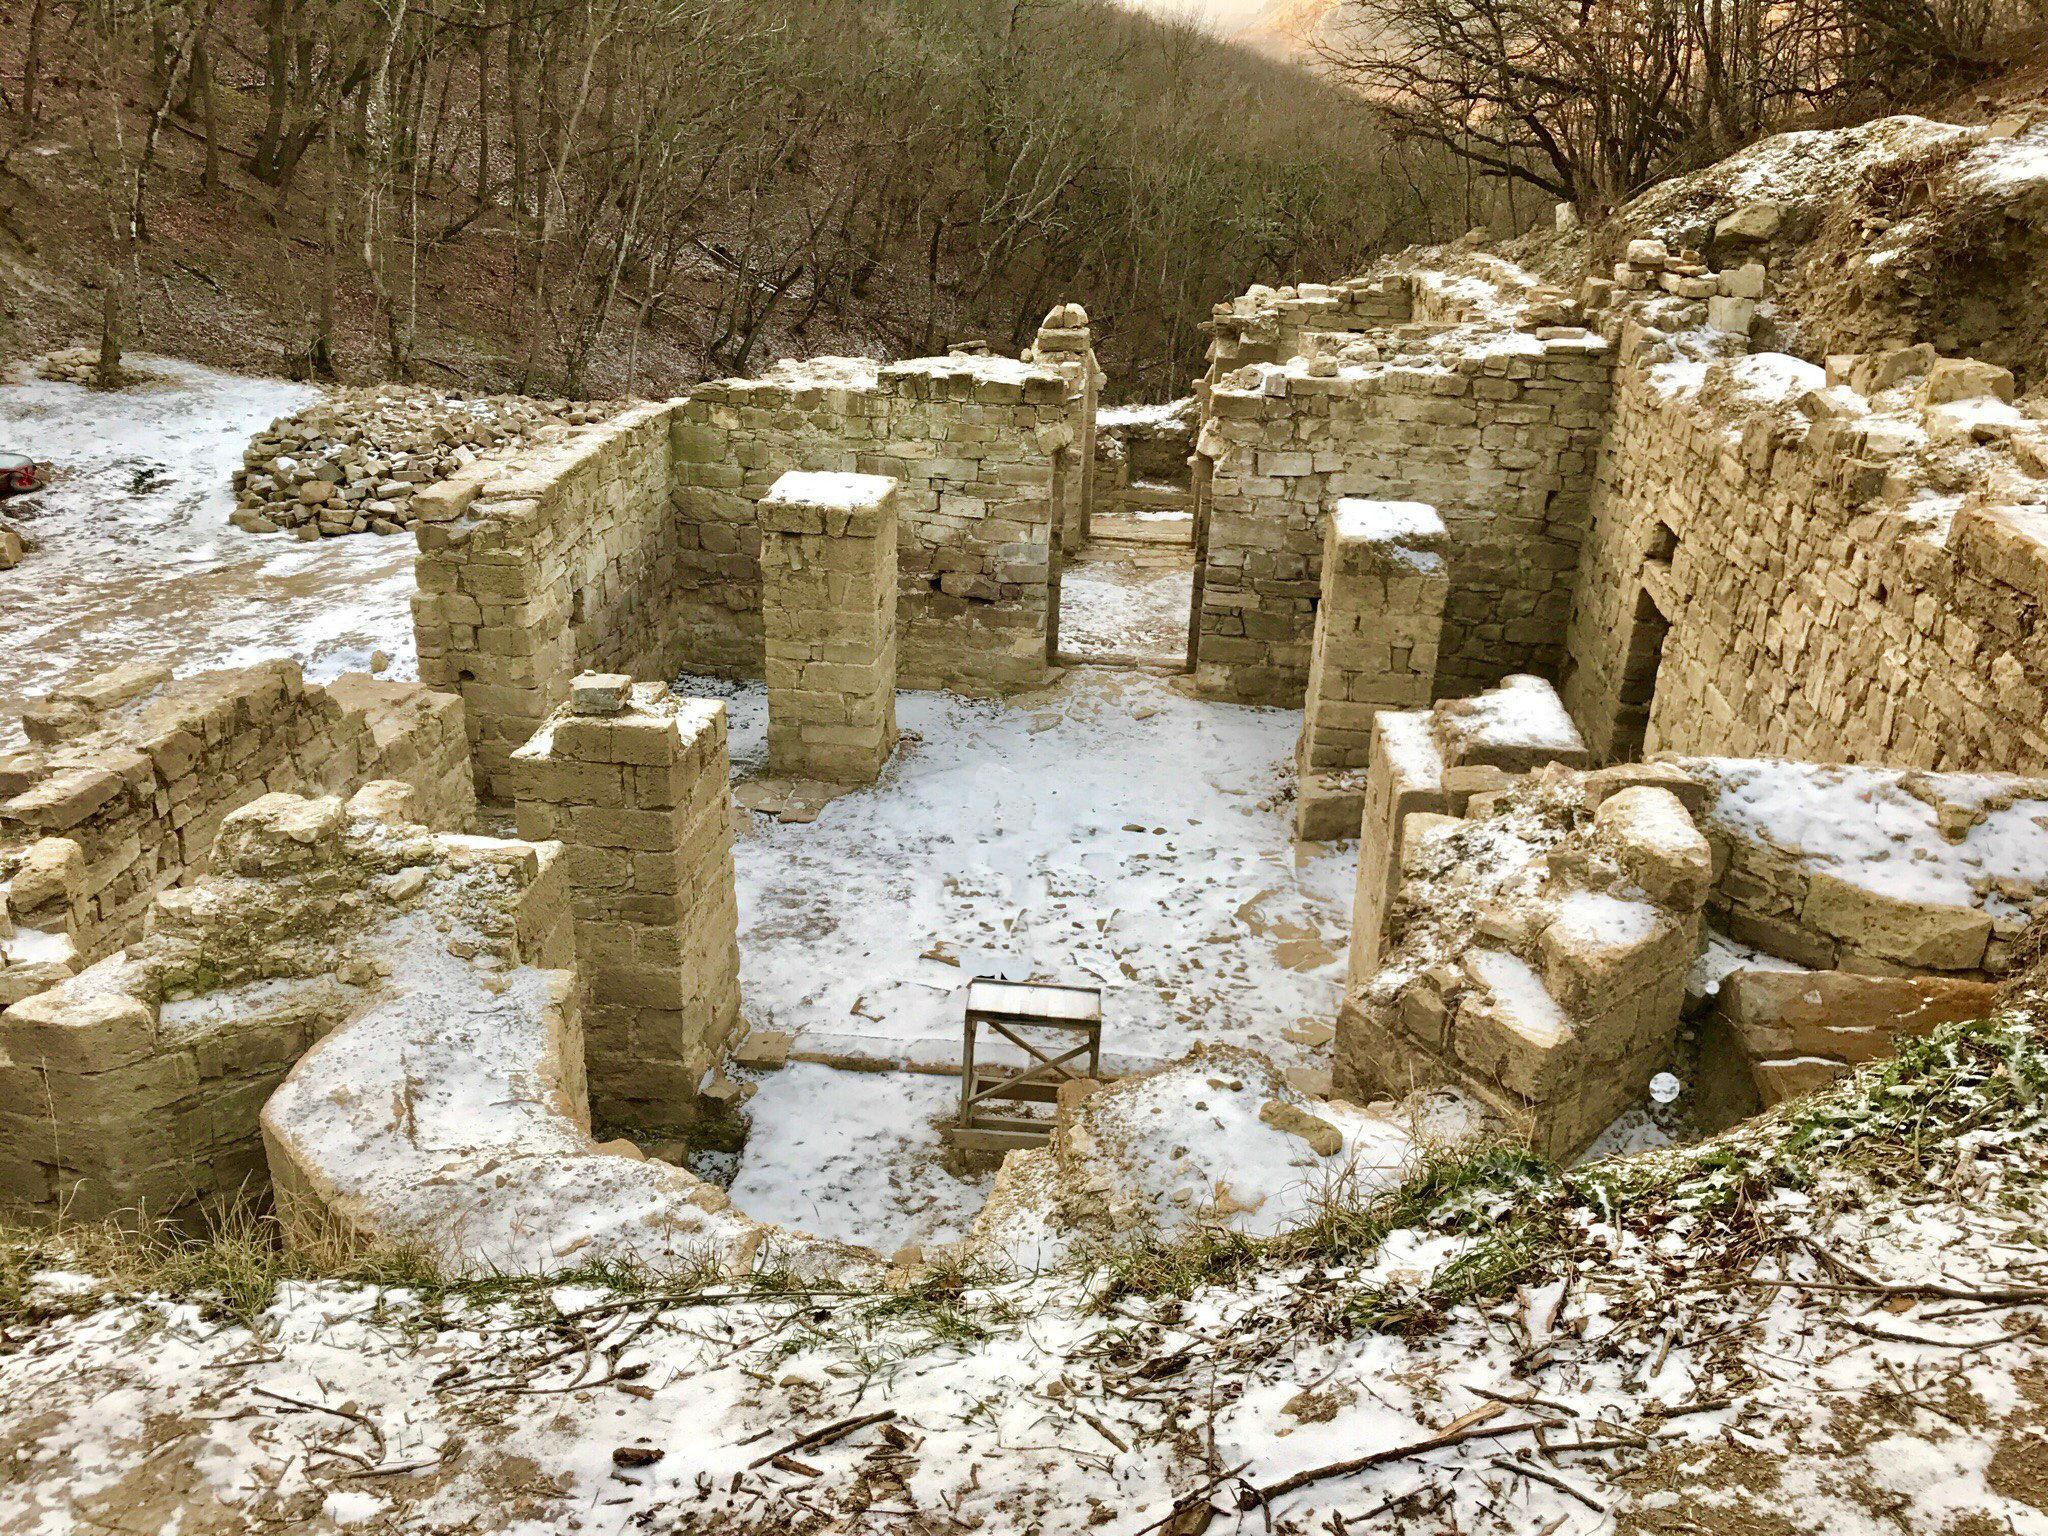 Византийский храм. Раскопки Судак